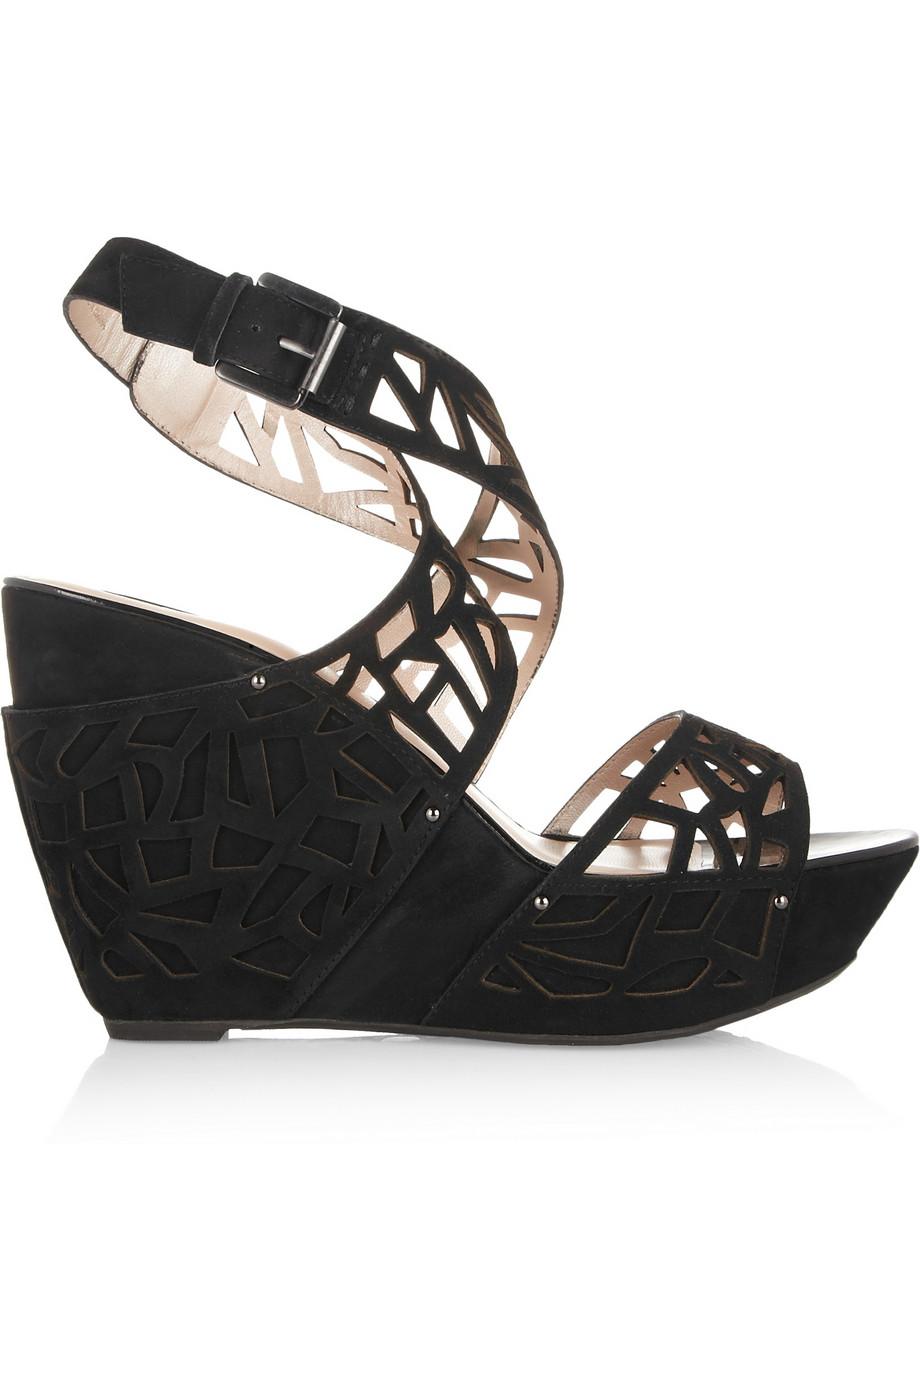 9d69809989f Dkny Margo Lasercut Wedge Sandals in Black - Lyst